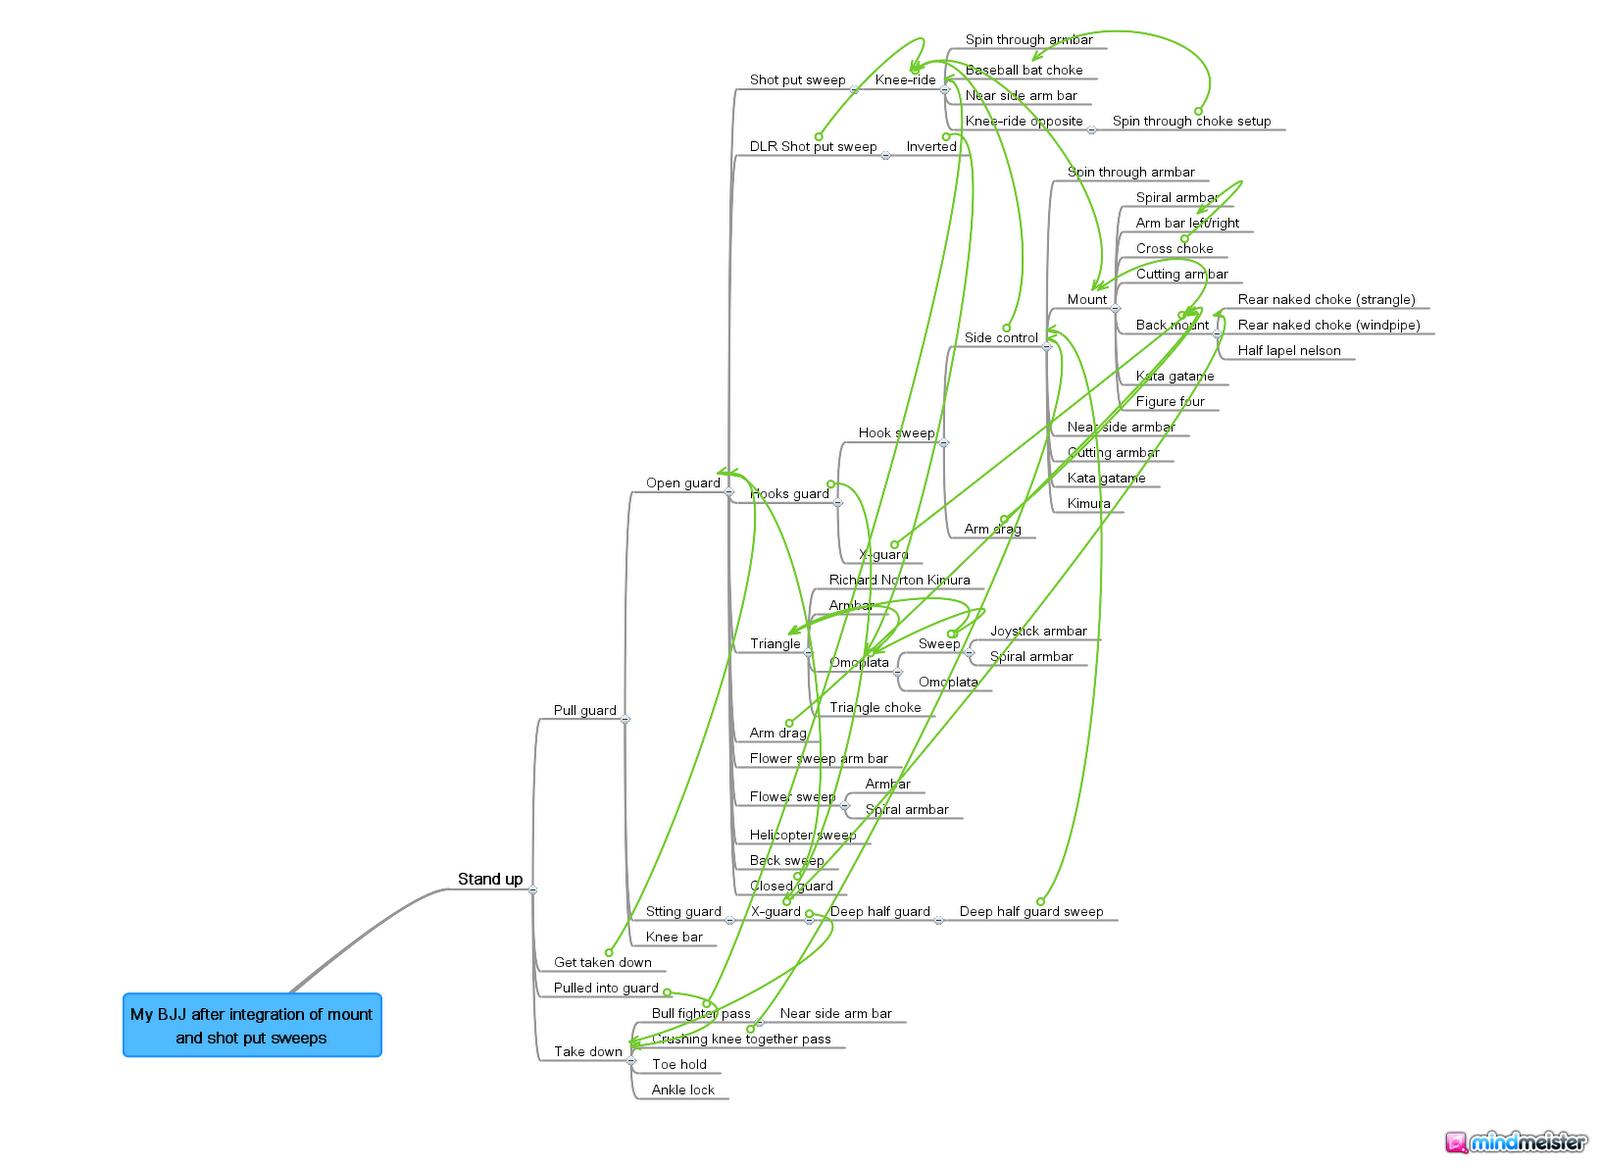 Bjj Flow Chart Related Keywords & Suggestions - Bjj Flow